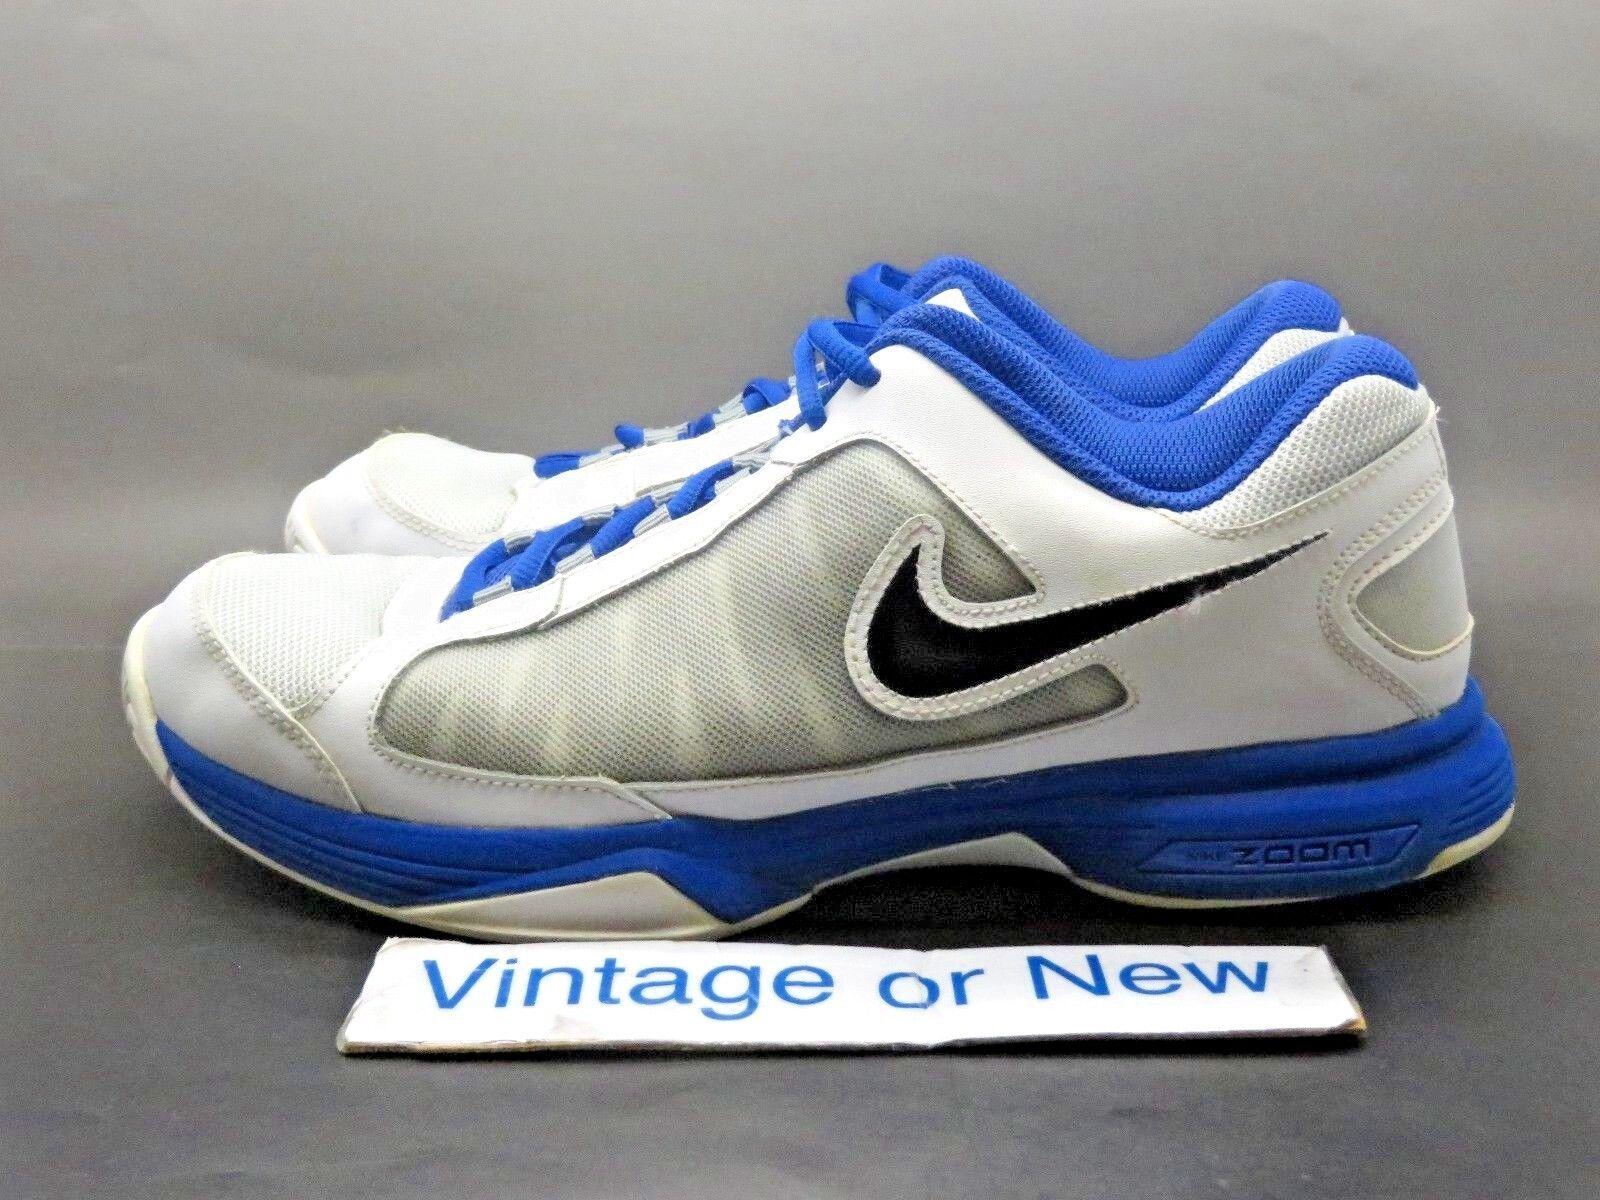 1b1ec02fb601 ... Women s Nike Zoom Courtlite Courtlite Courtlite 3 Platinum White Black  Blue Tennis 487996-001 sz ...